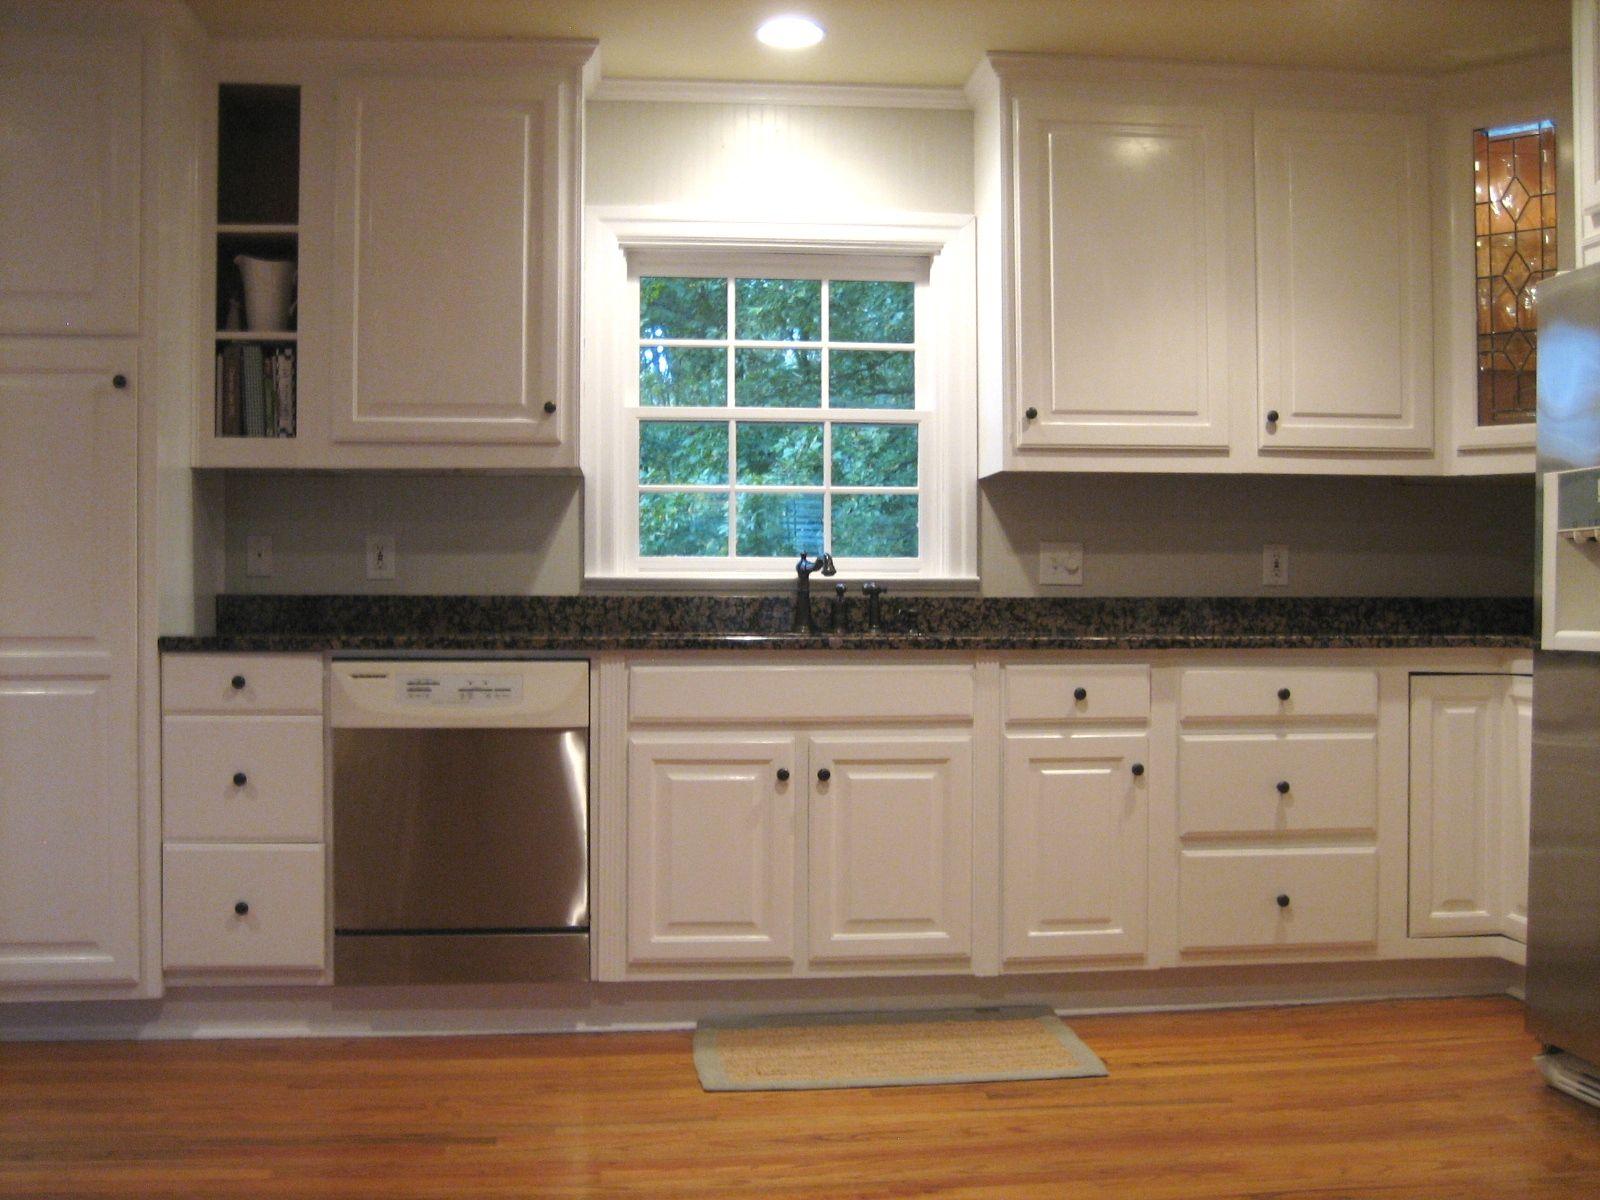 Google Image Result For Http 3 Bp Blogspot Com Aue8isv0hb4 Tmbr1ykvgmi Aaaaaaaabv0 Kitchen Cupboard Designs Cheap Kitchen Cabinets Modern Kitchen Cupboards